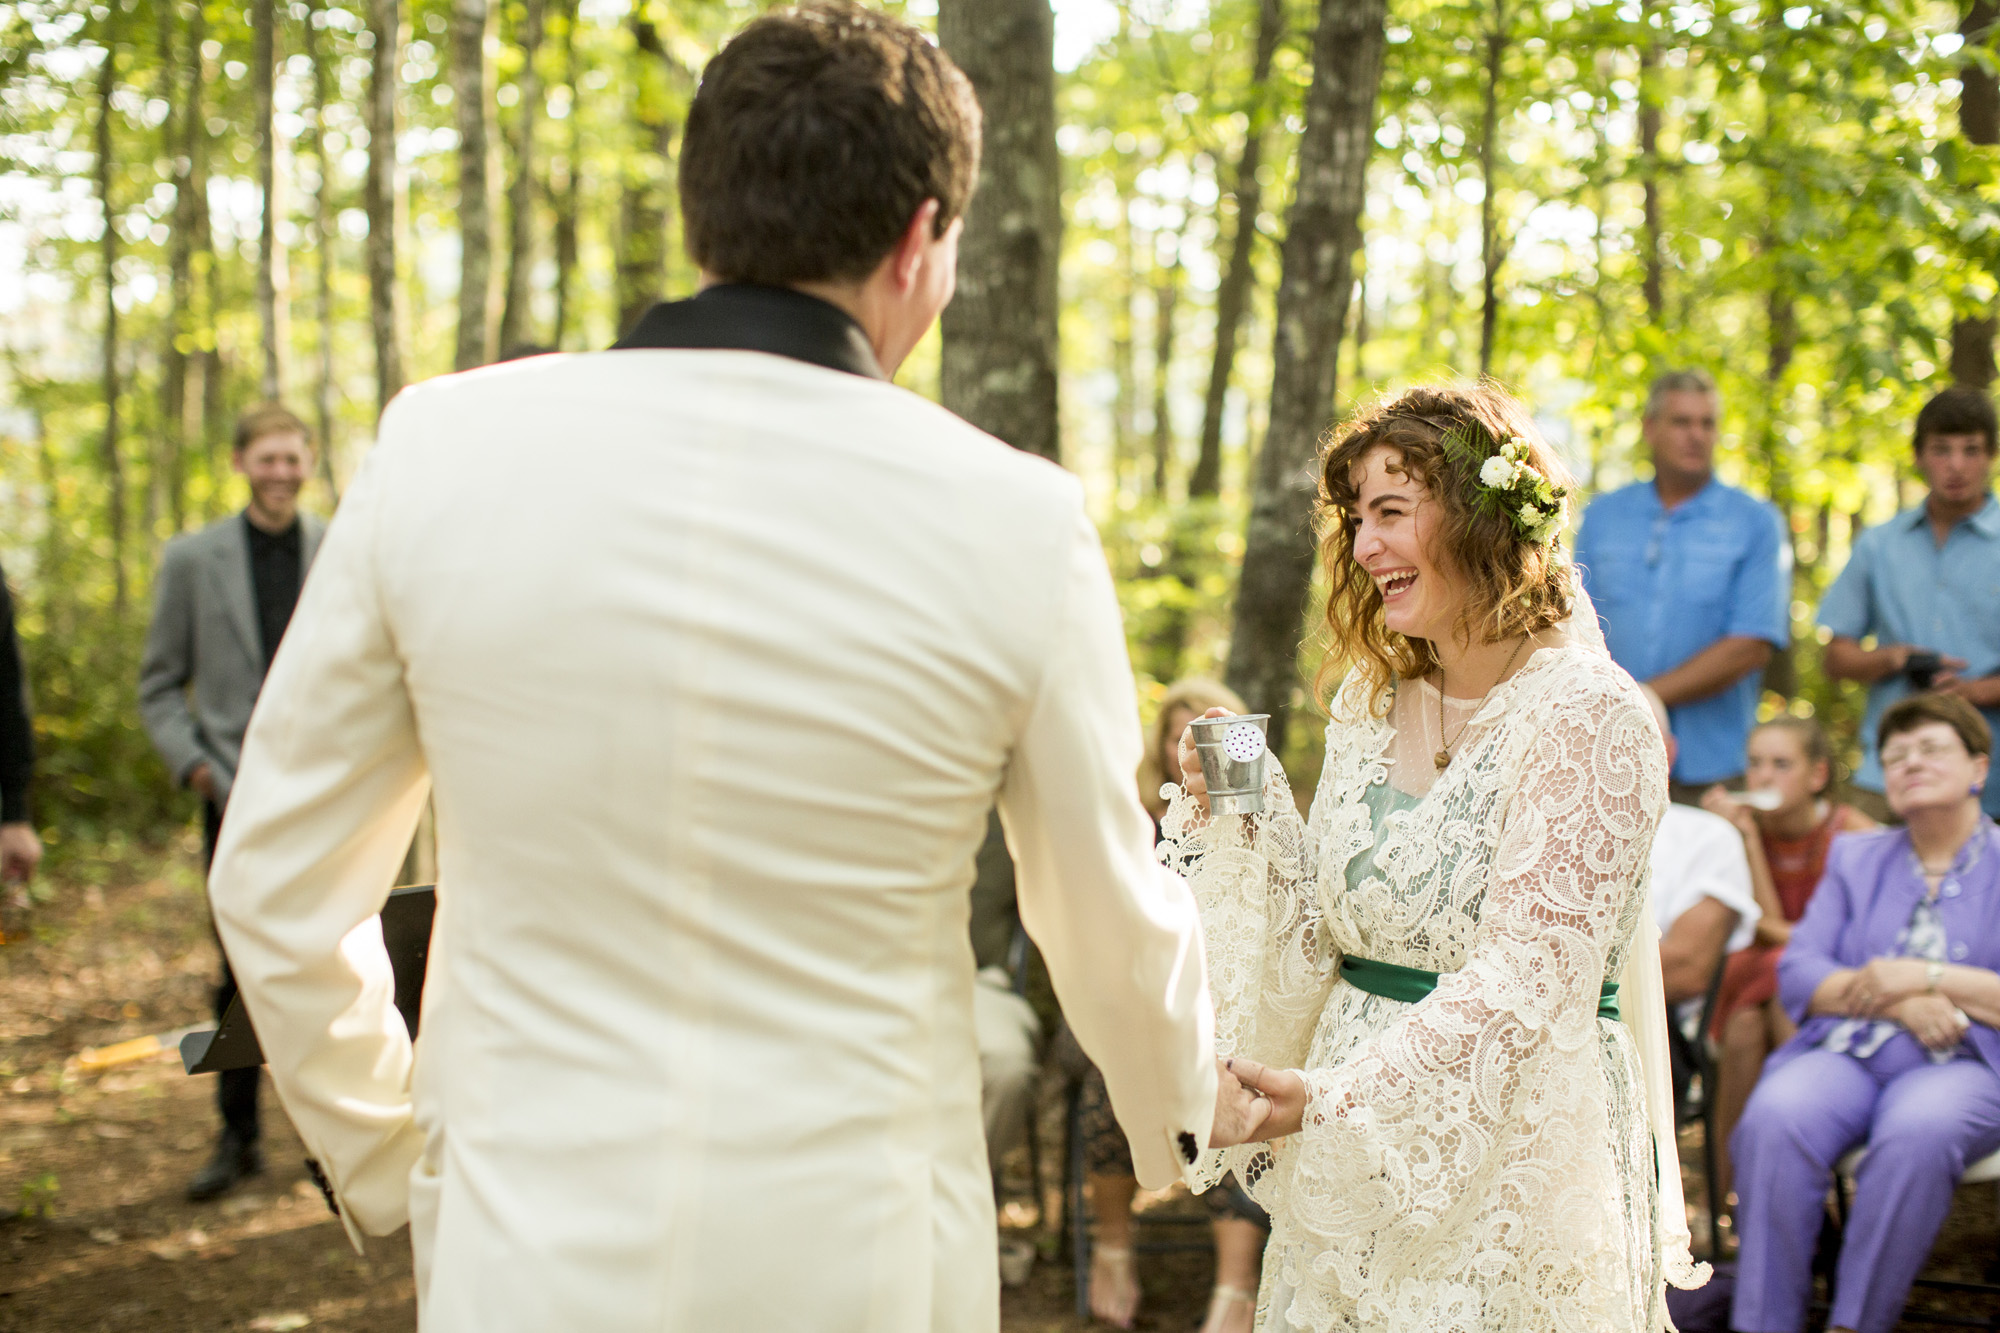 Seriously_Sabrina_Photography_Red_River_Gorge_Kentucky_Wedding_ShawnDana129.jpg